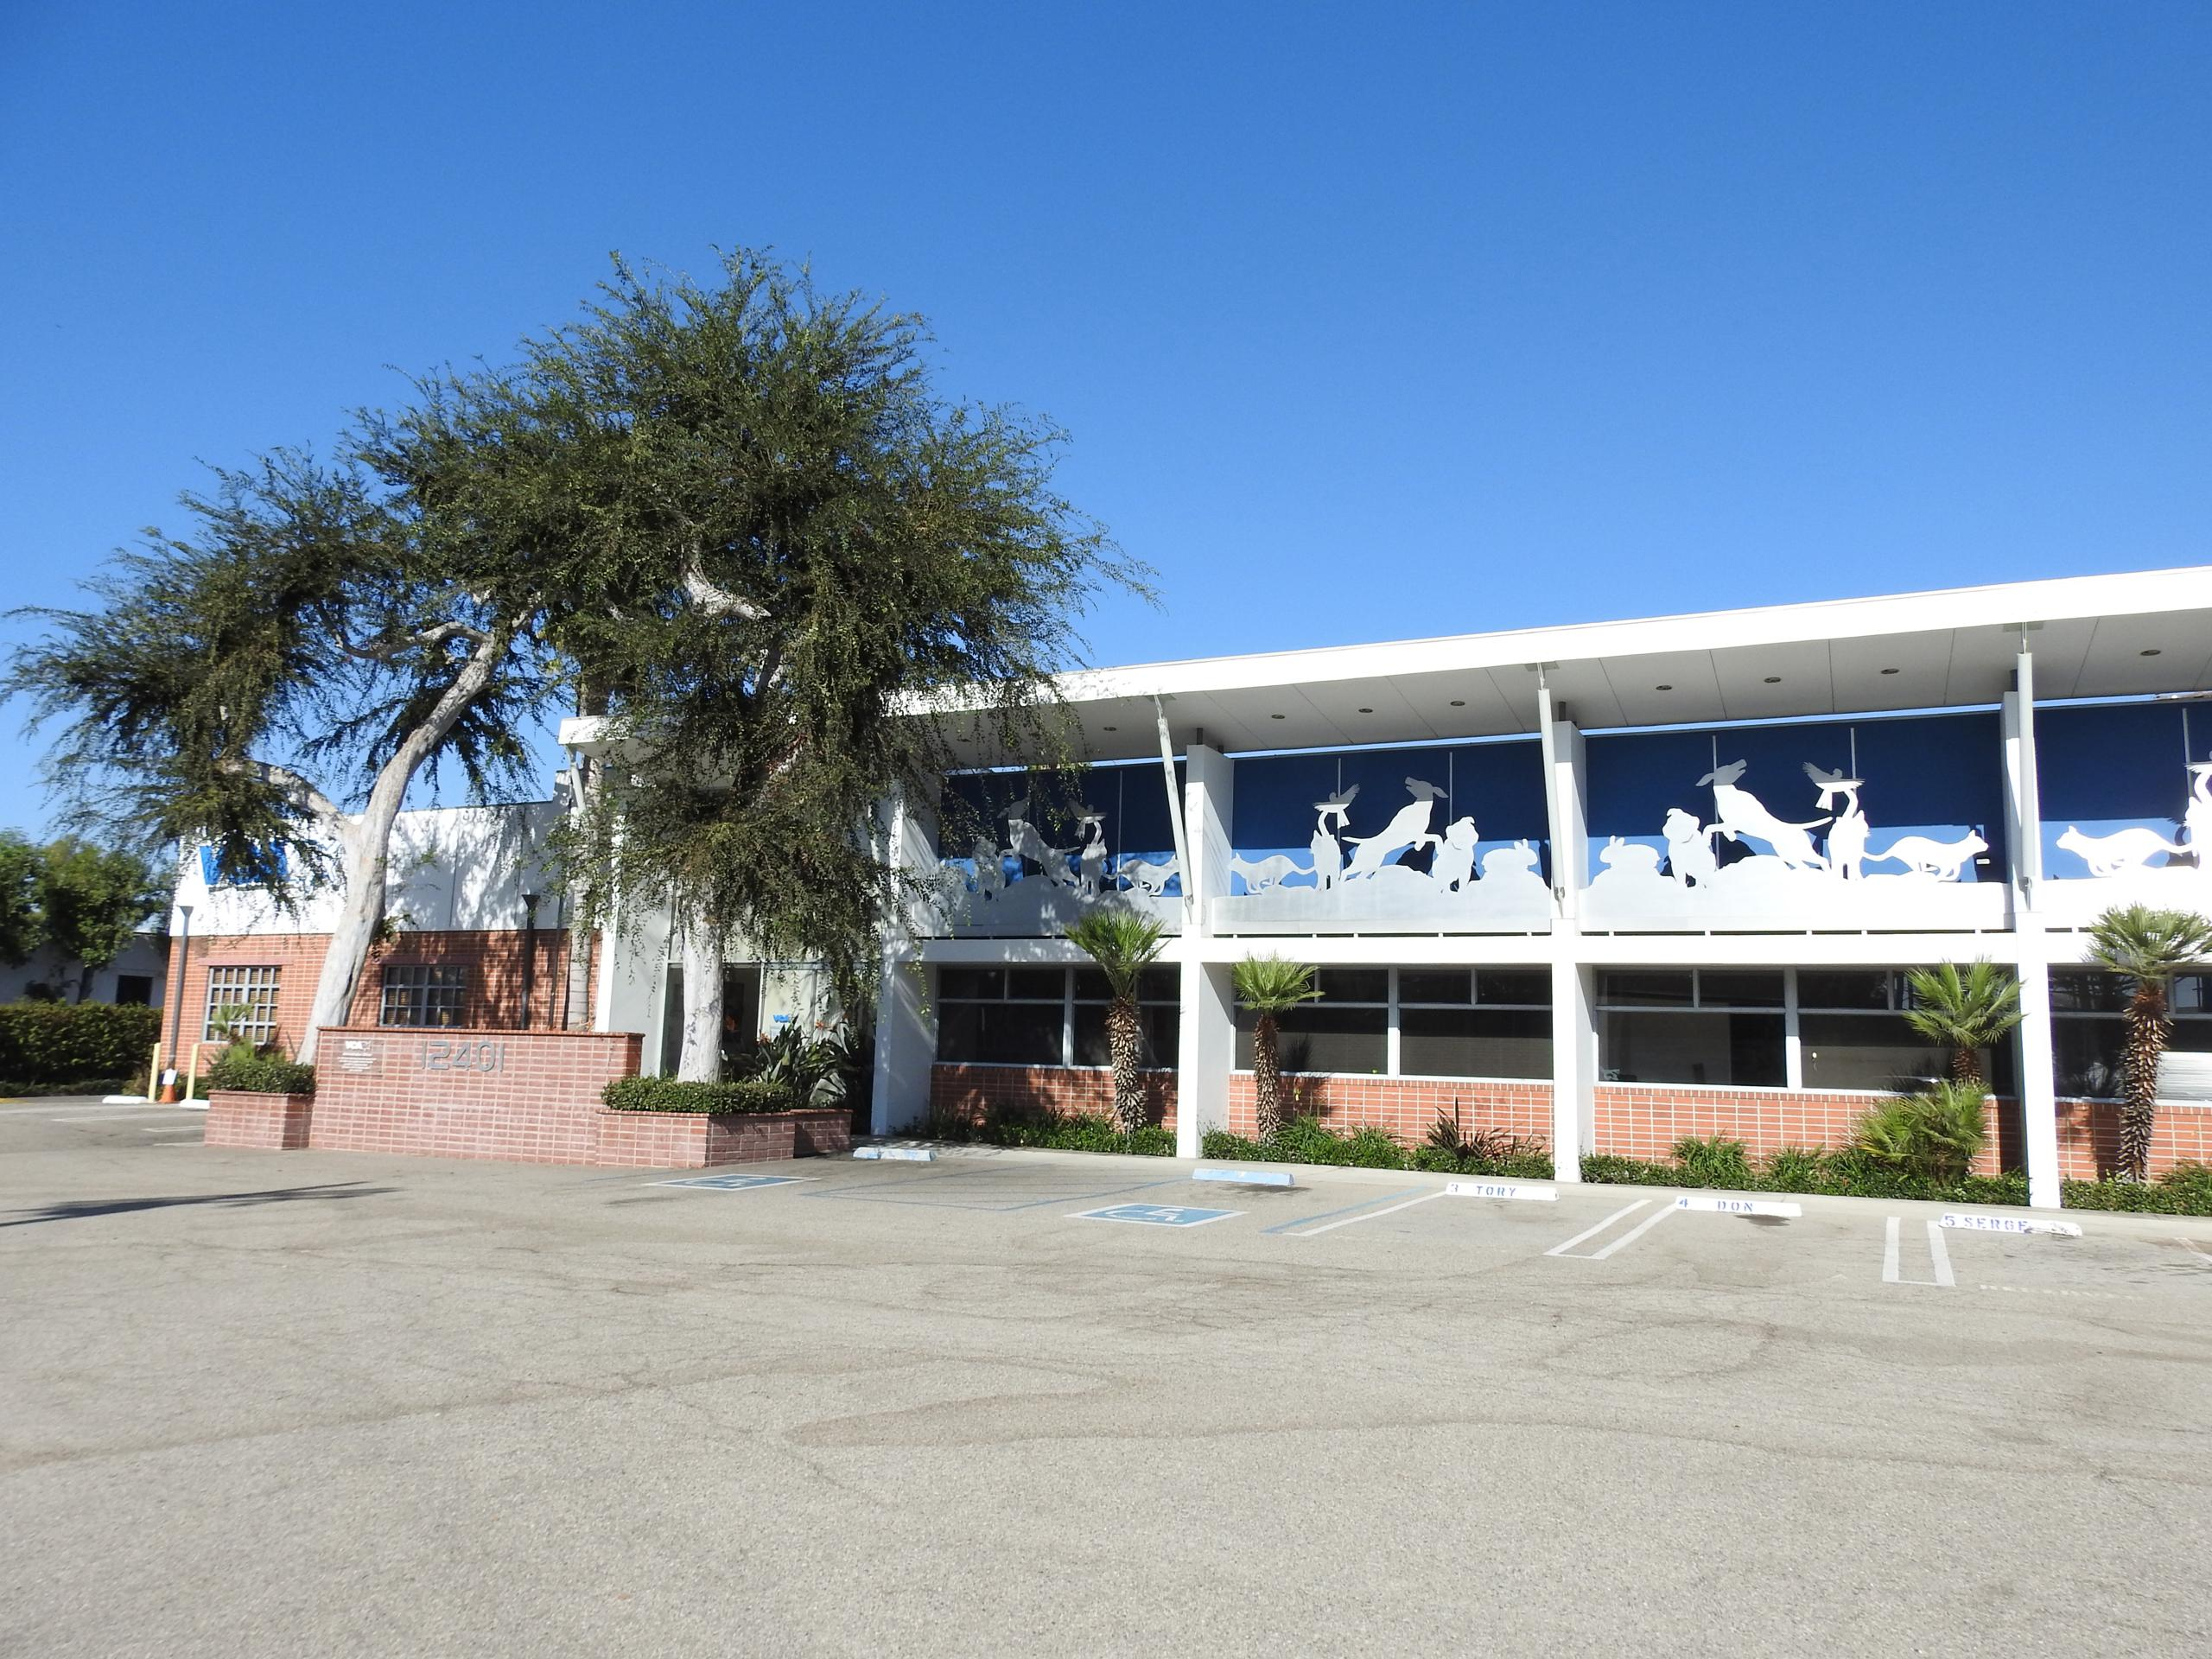 VCA's corporate headquarters in Los Angeles, California.